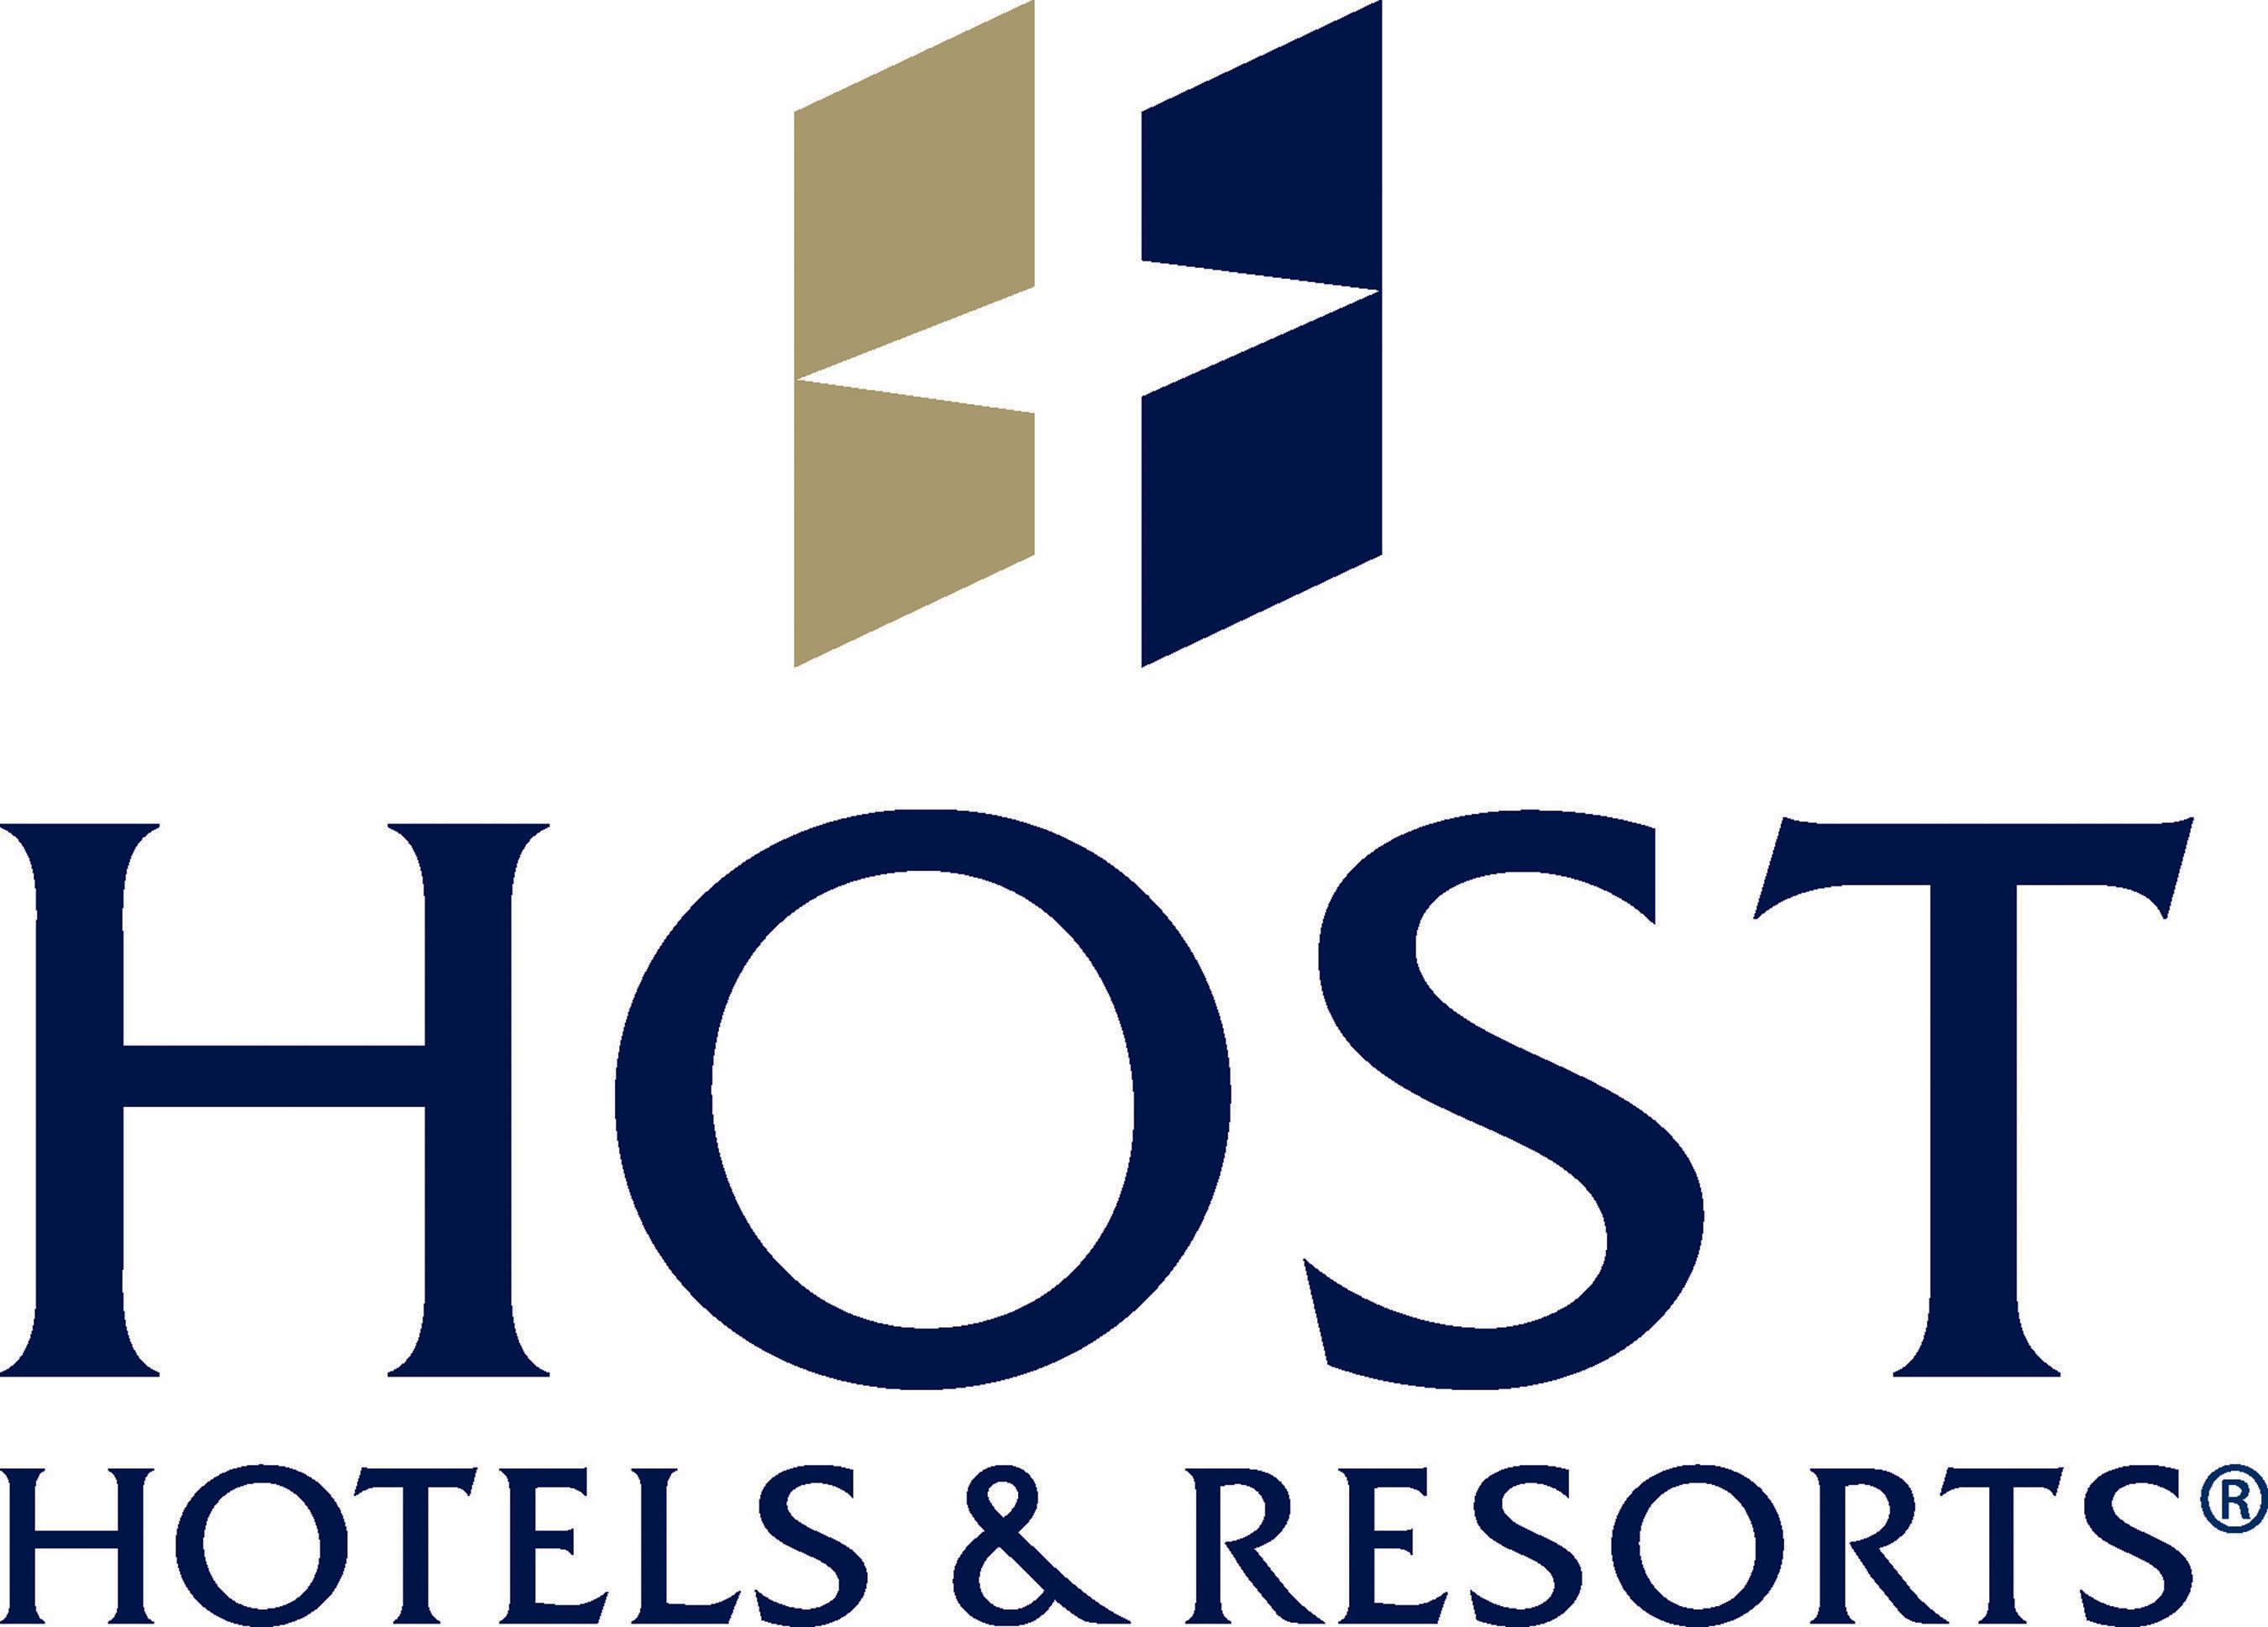 Host Hotels & Resorts, Inc. logo. (PRNewsFoto/Host Hotels & Resorts, Inc.) (PRNewsFoto/)